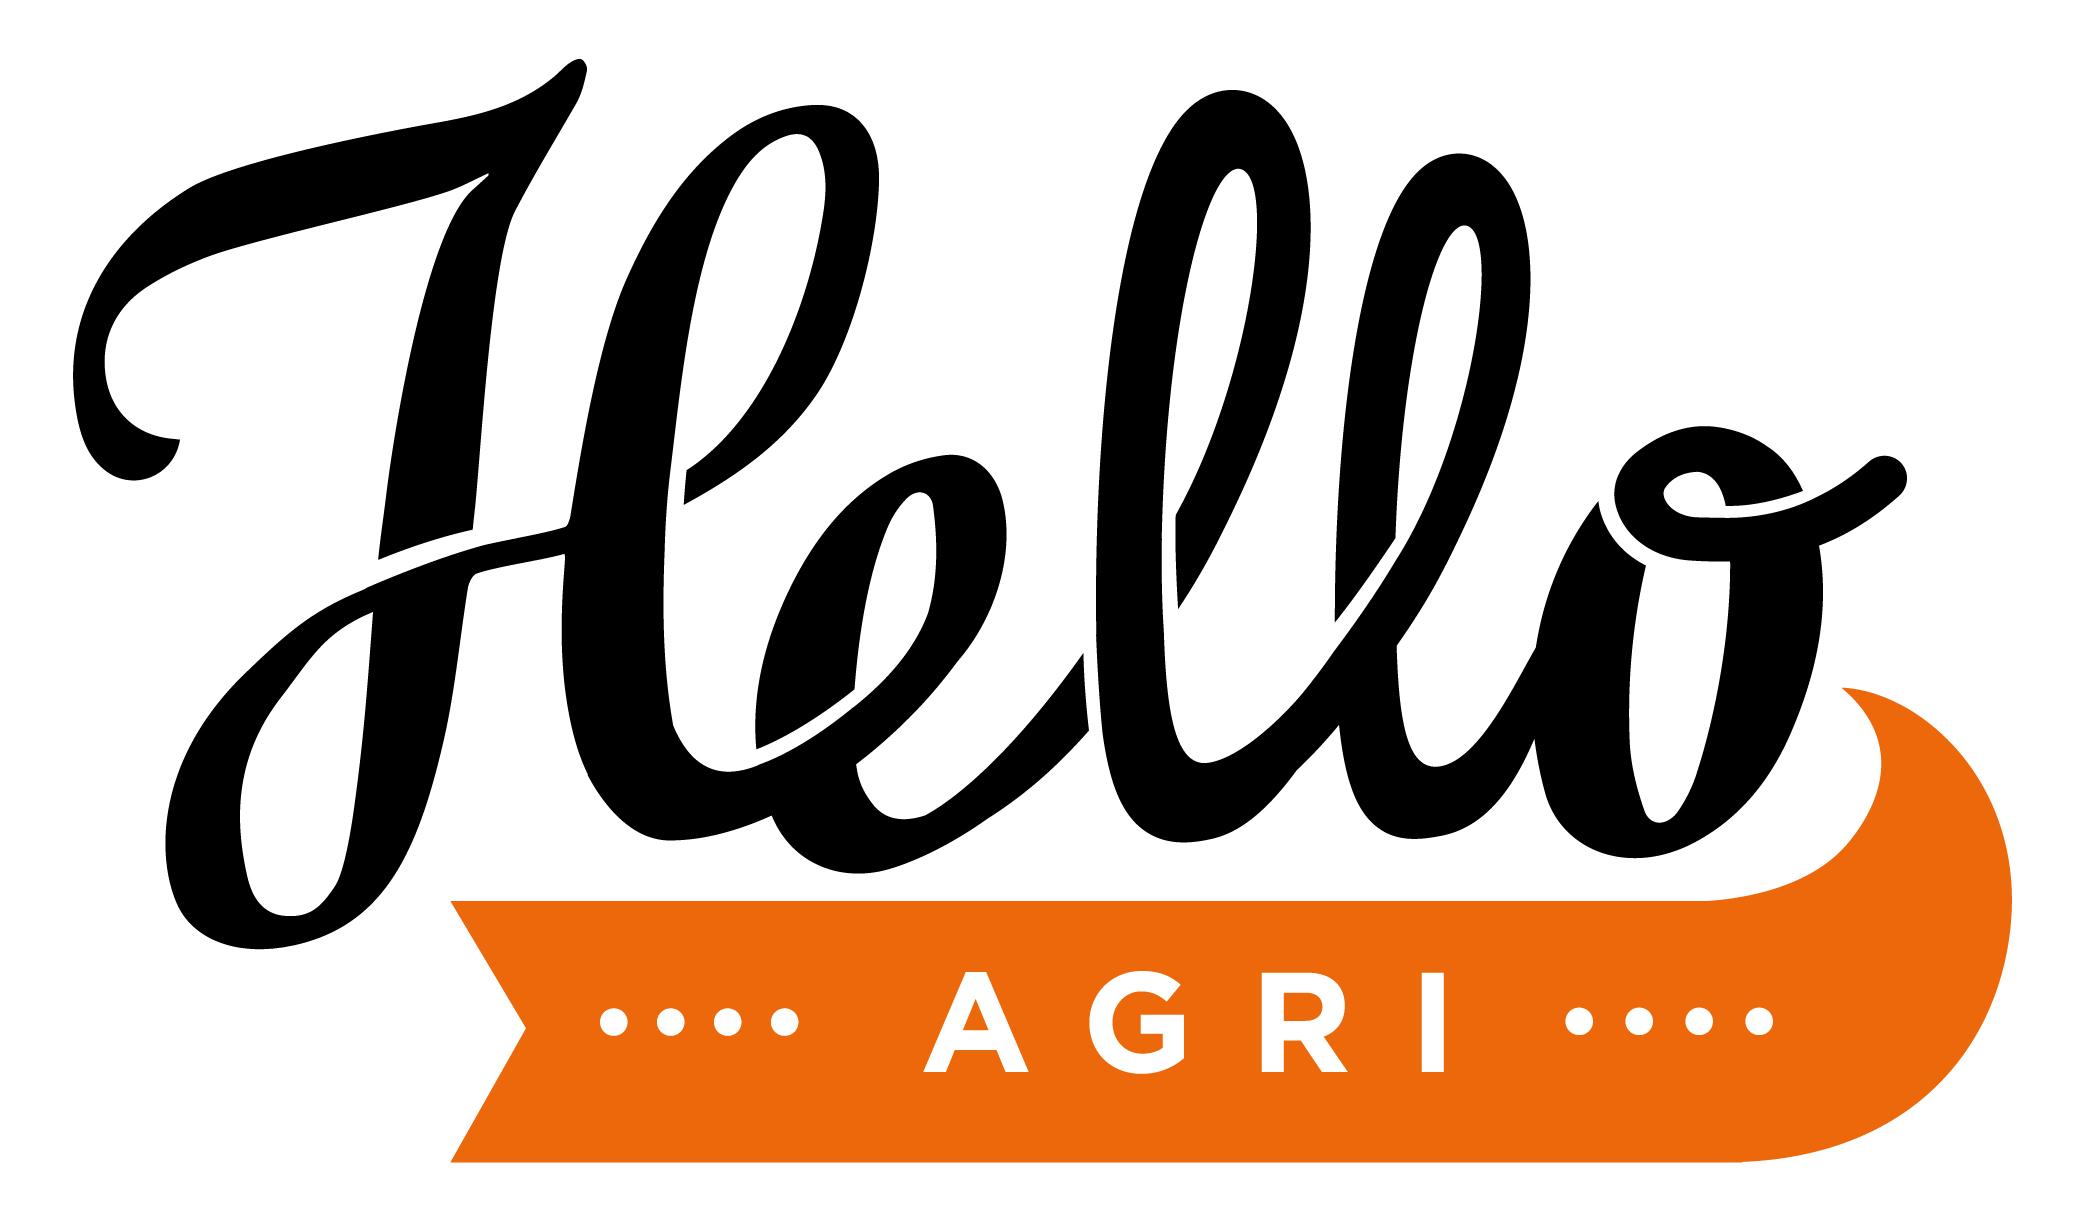 FORMAL-Hello-Agri.jpg